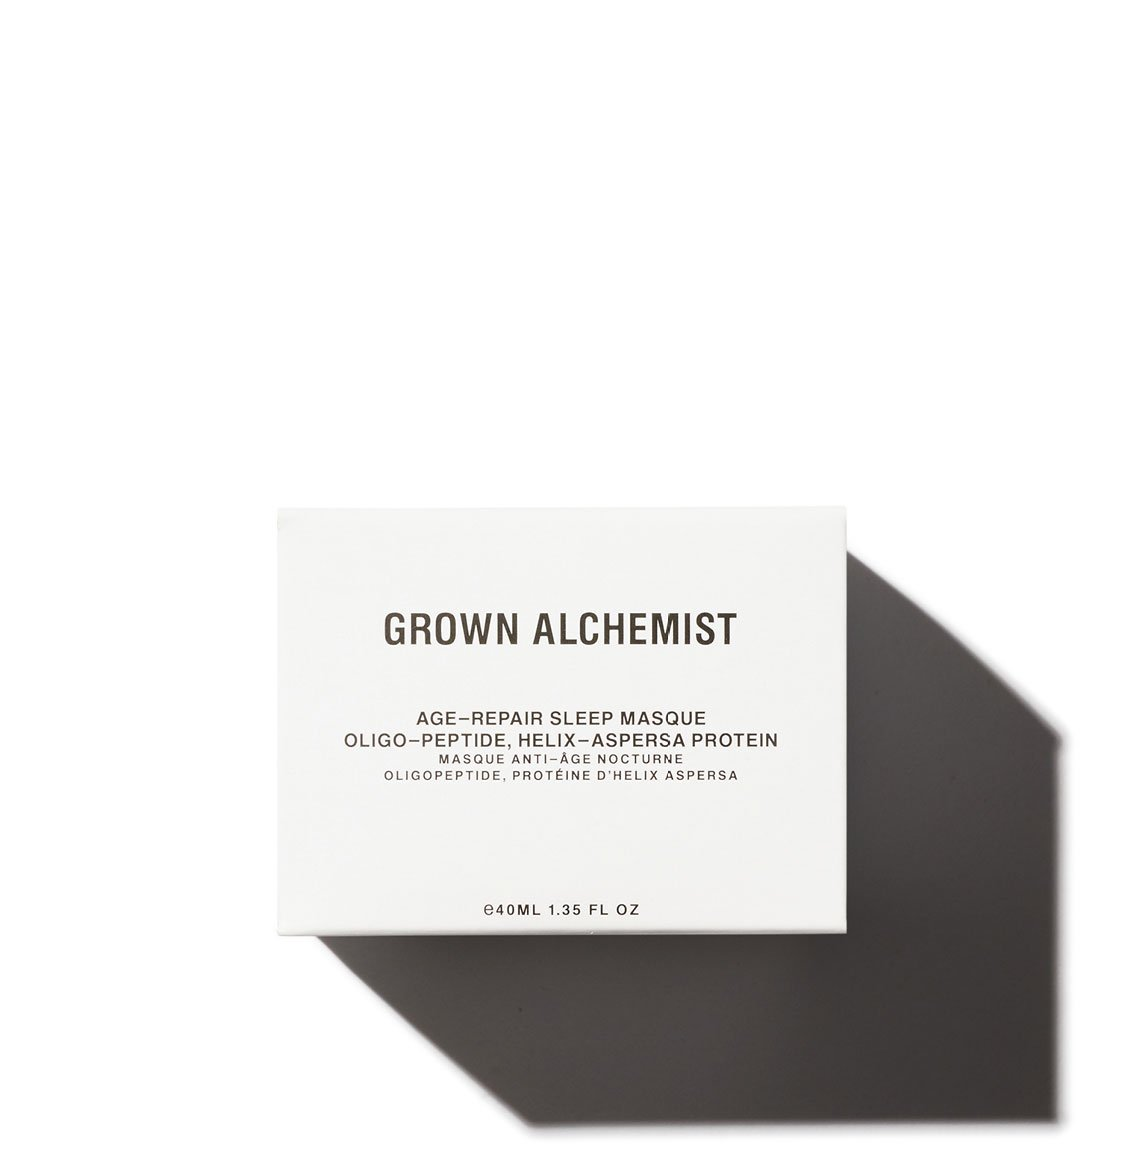 Grown Alchemist Age Repair Sleep Masque 40ml